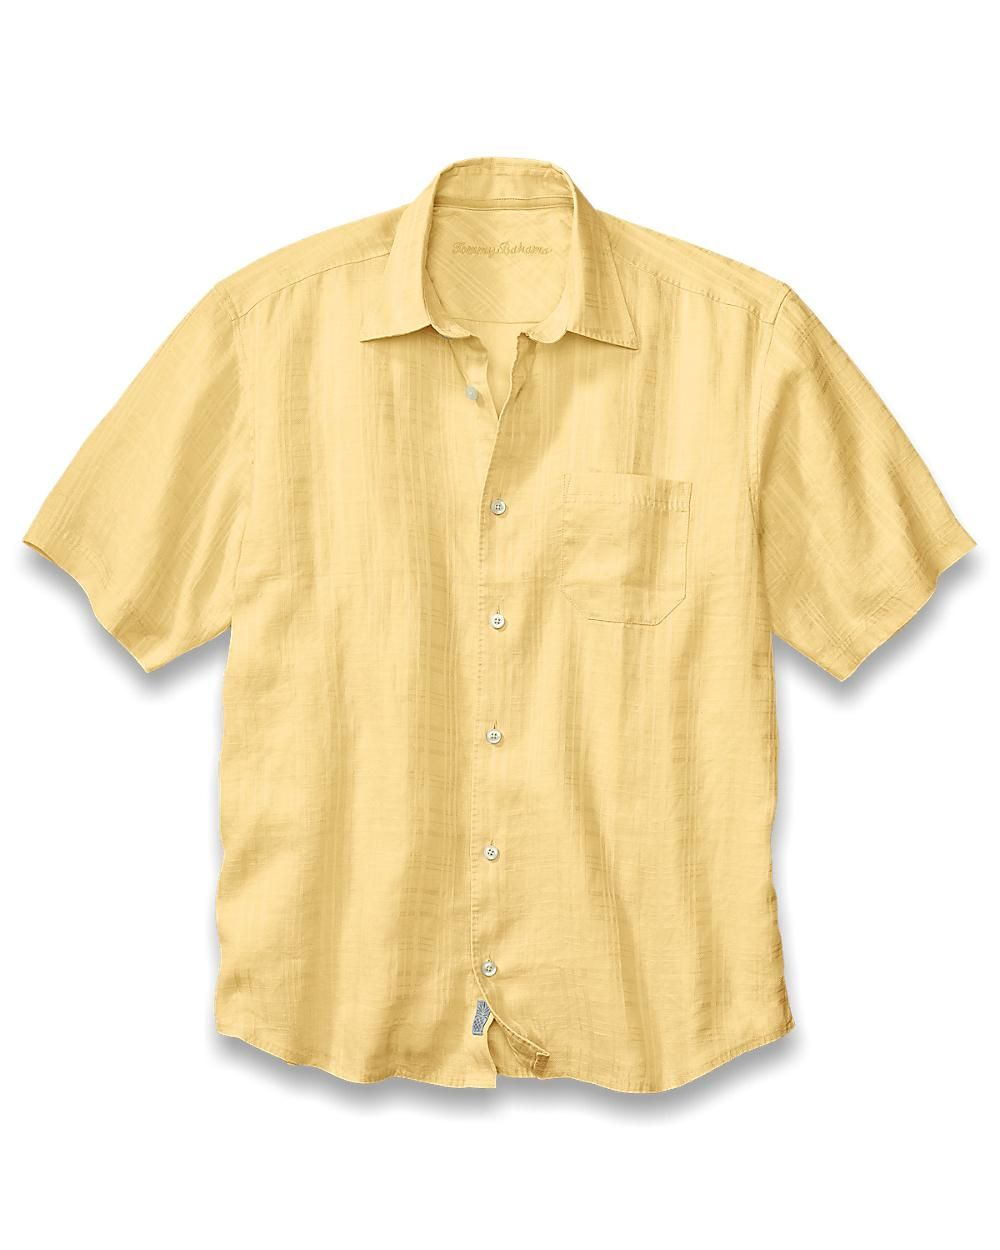 tim shirt